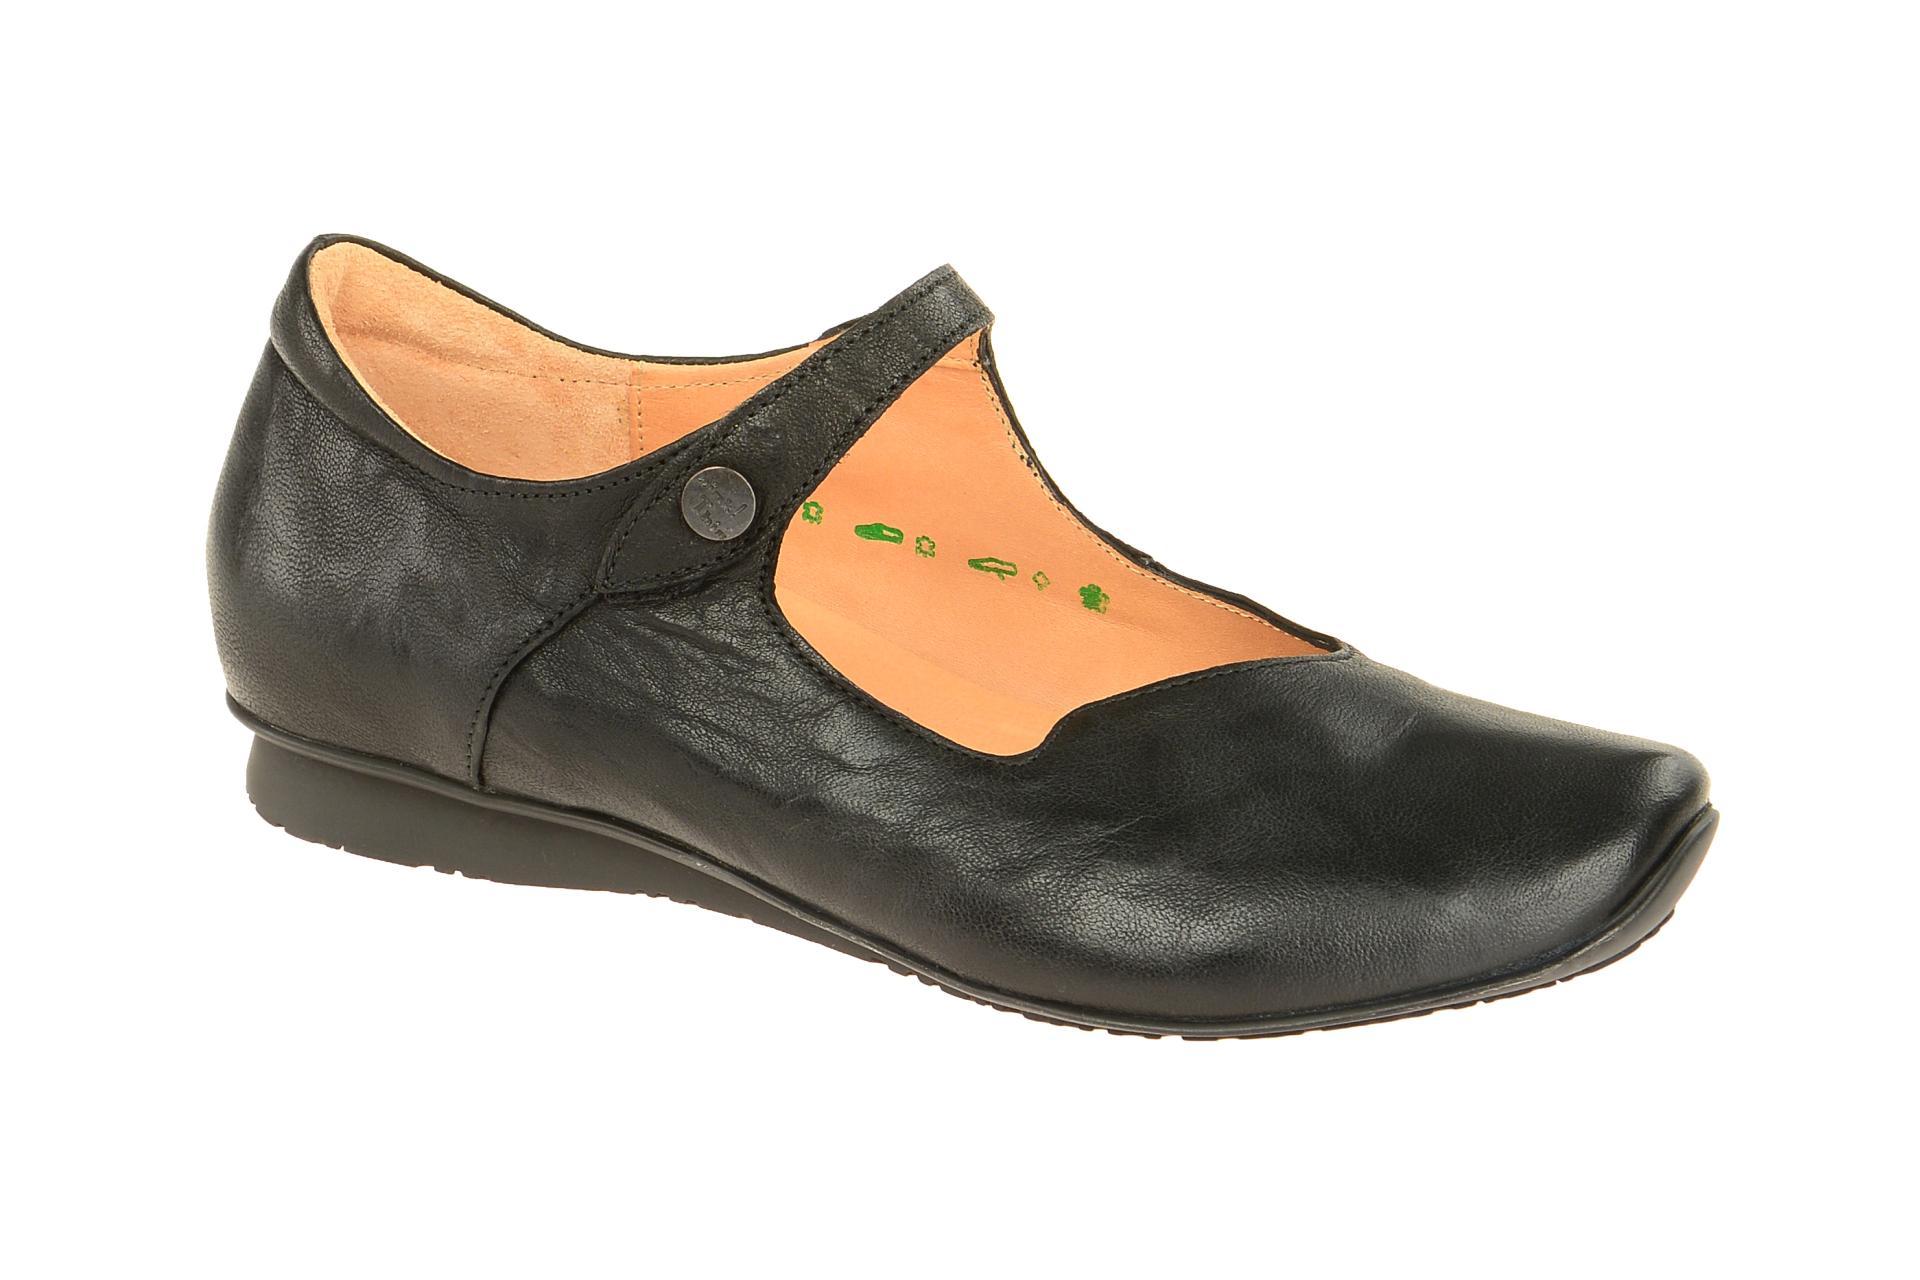 brand new a6fdc ef29e Details zu Think Schuhe CHILLI schwarz Damenschuhe bequeme Slipper  2-82107-00 NEU